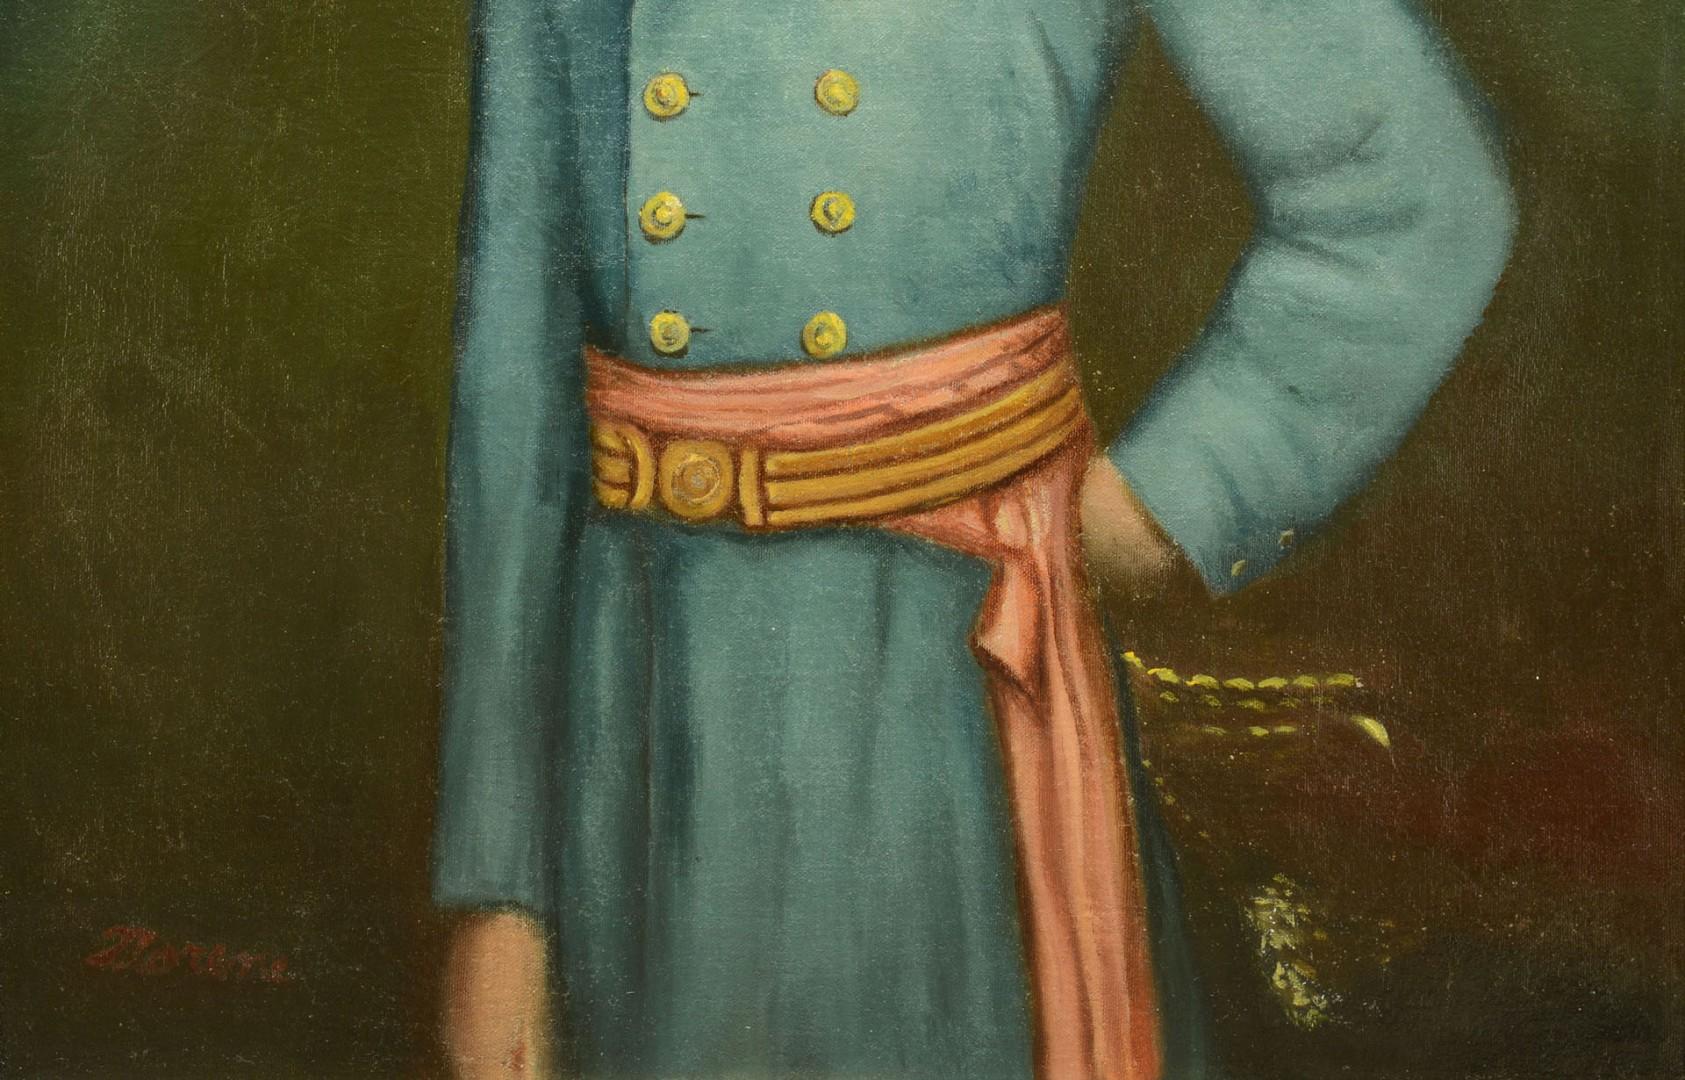 Portrait of Robert E. Lee on tent canvas